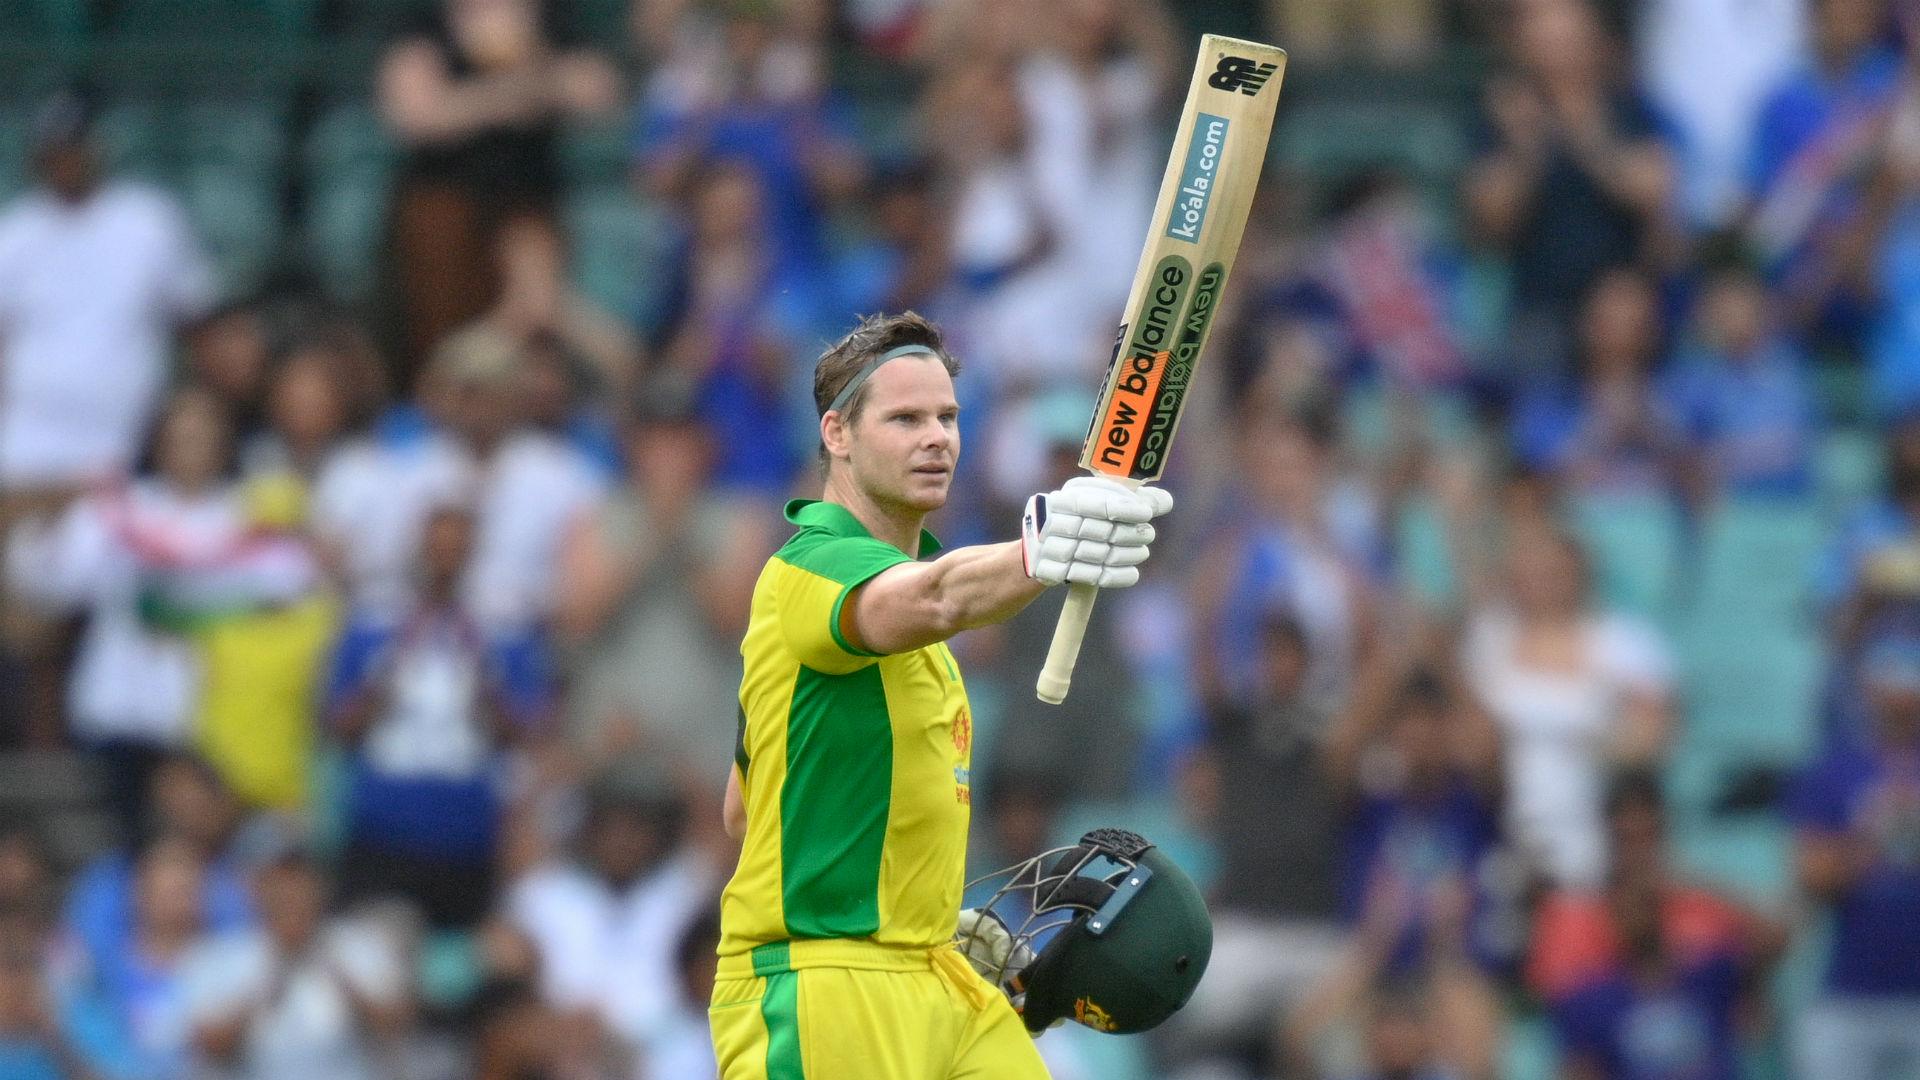 Smith repeats SCG heroics as Australia clinch series